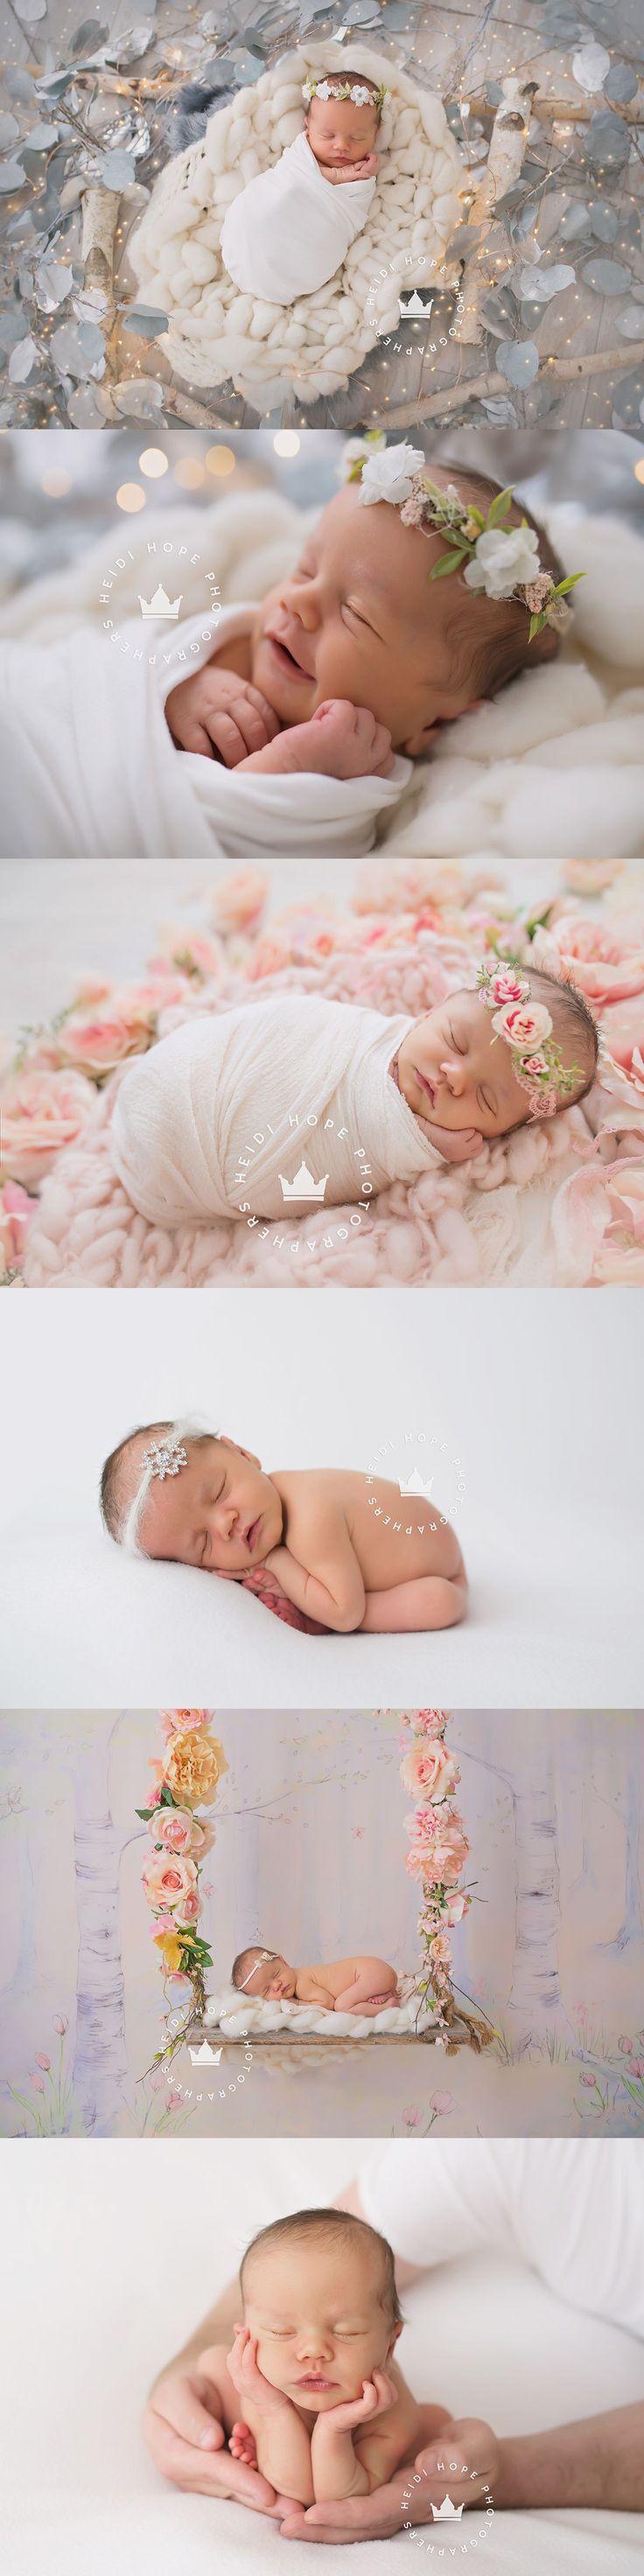 heidi hope newborn #photography baby girl holiday floral rhode island photographer